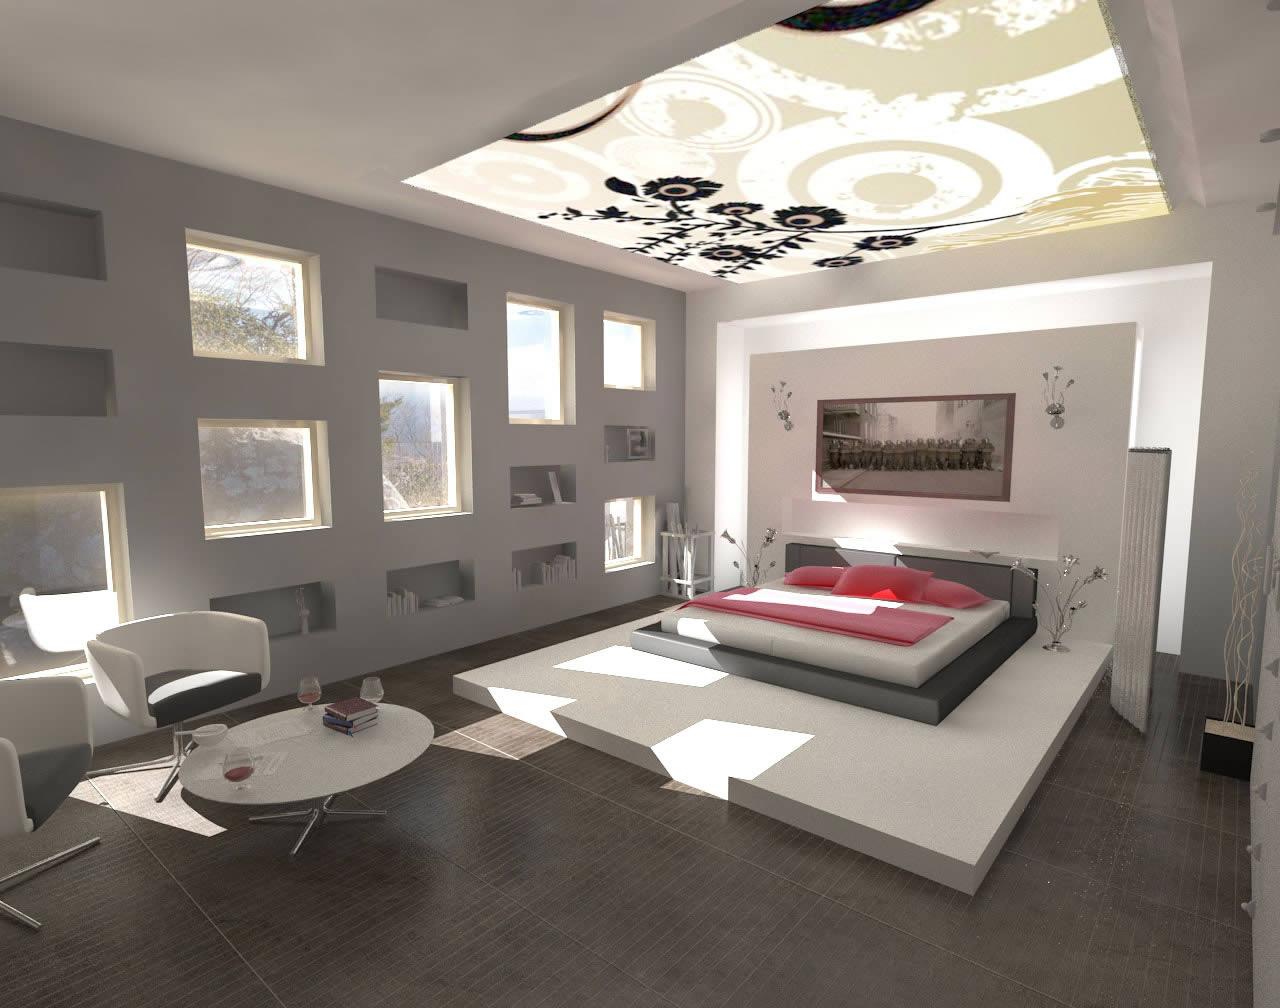 1280x1008px 6 Unique Home Interior Design Ideas Picture in Bedroom